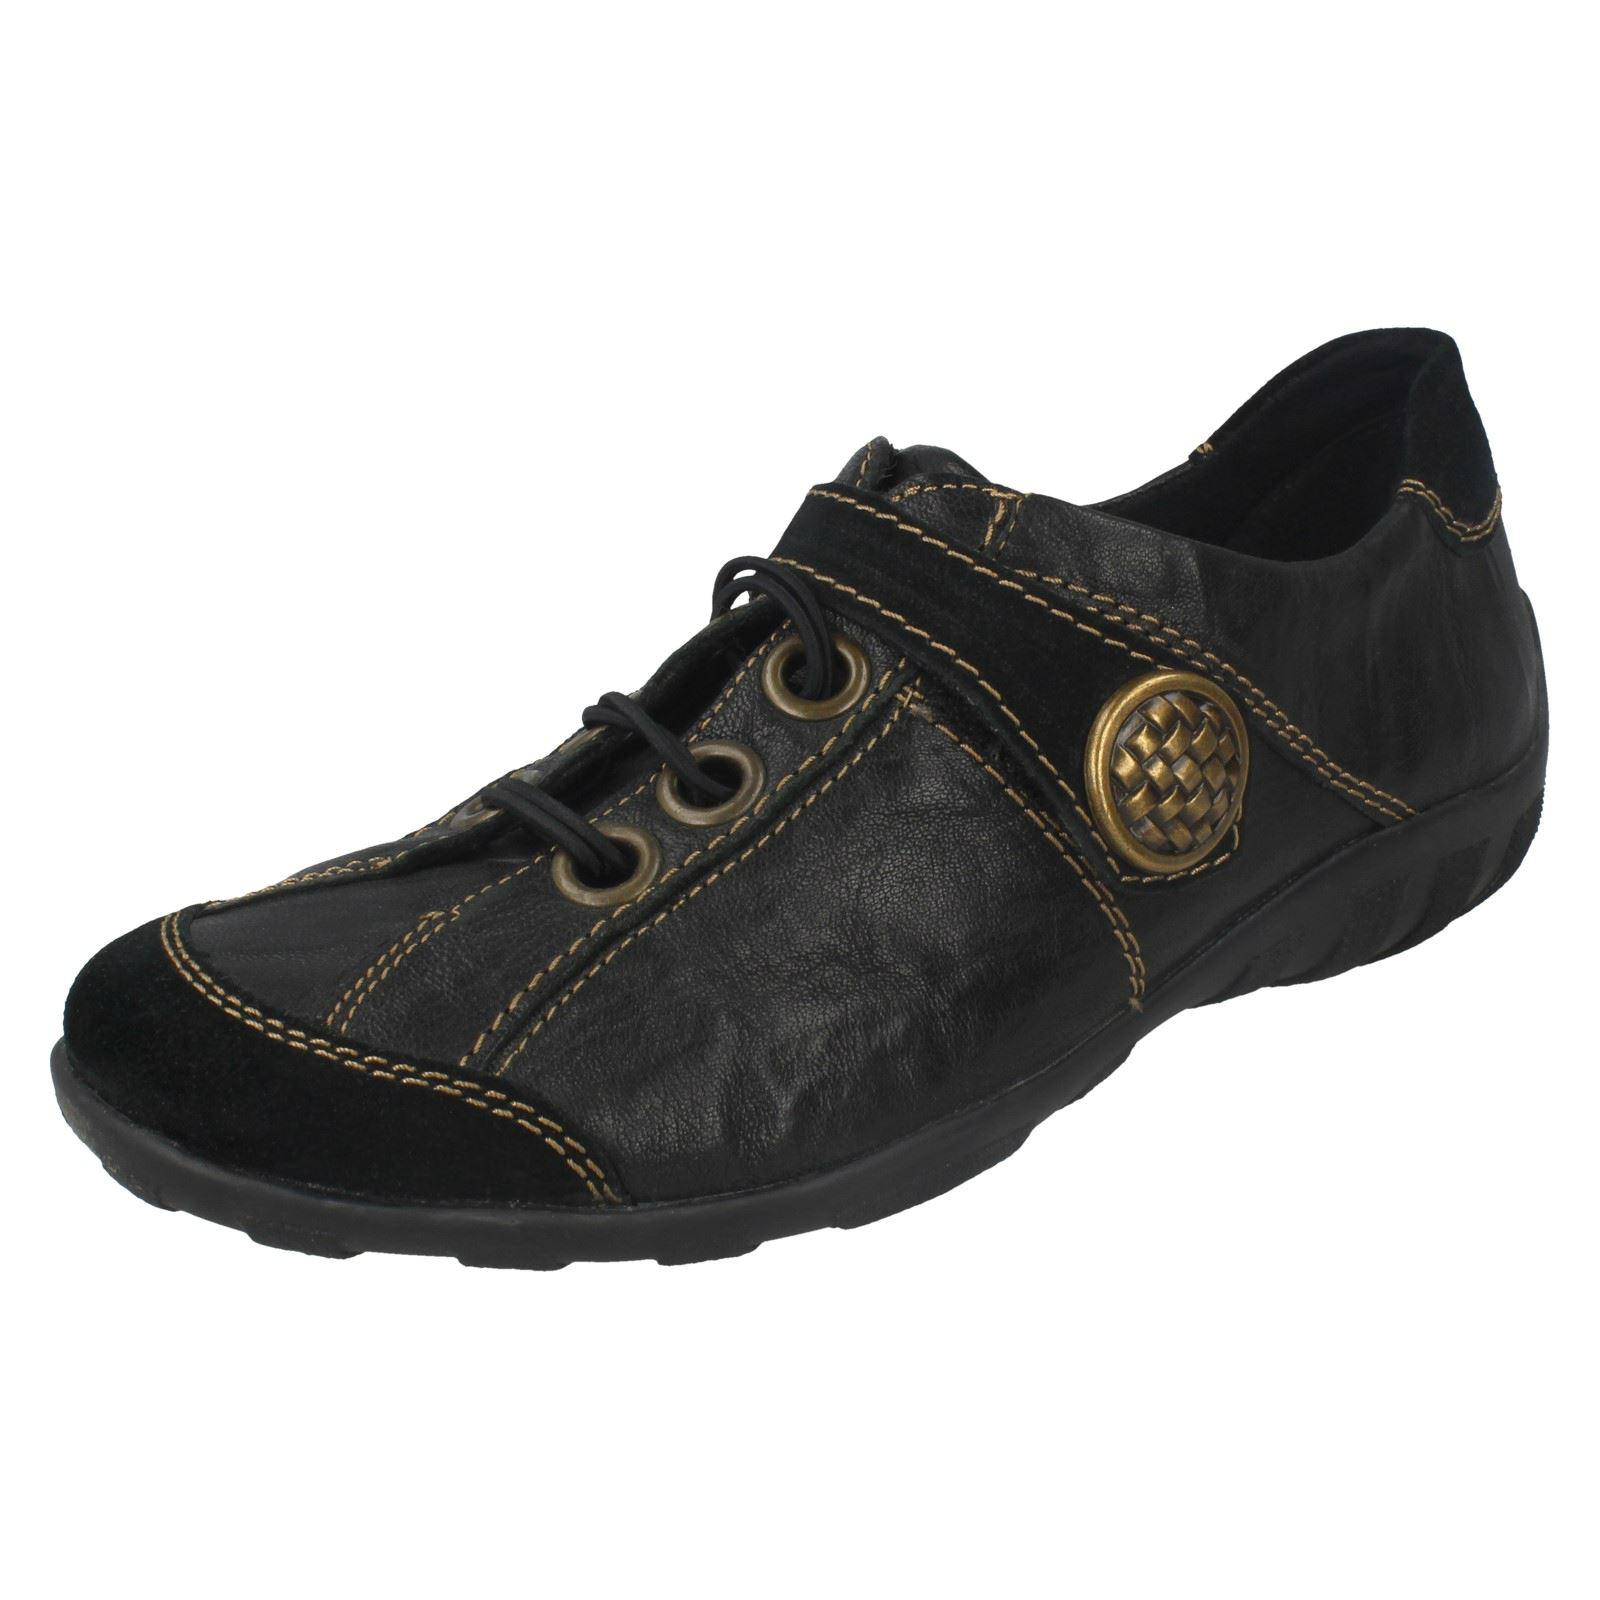 Remonte Dorndorf Shoe Shop